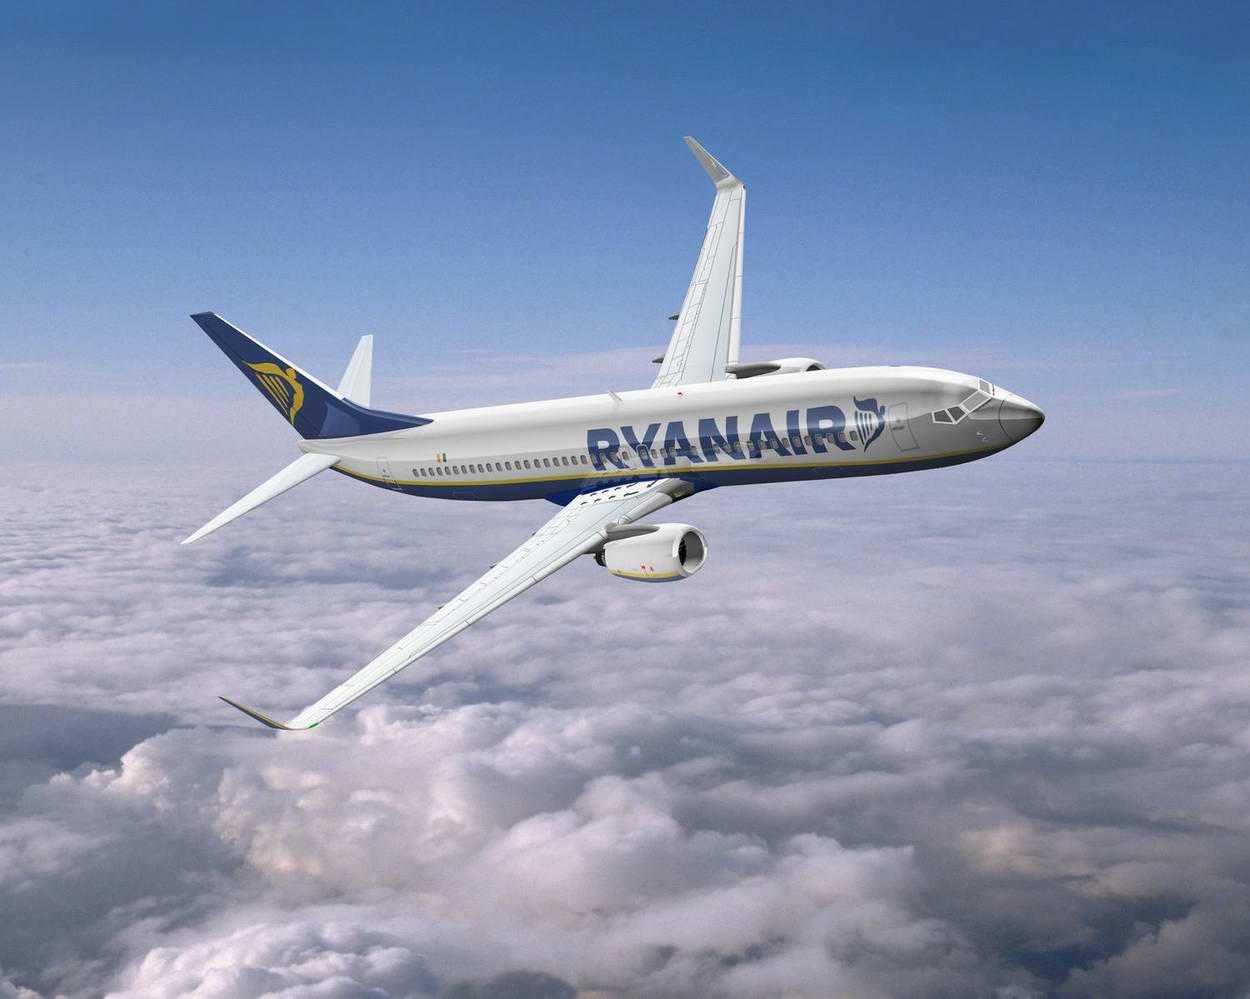 Ryanair introduce una tassa di 2 euro!!! Infoturismiamoci